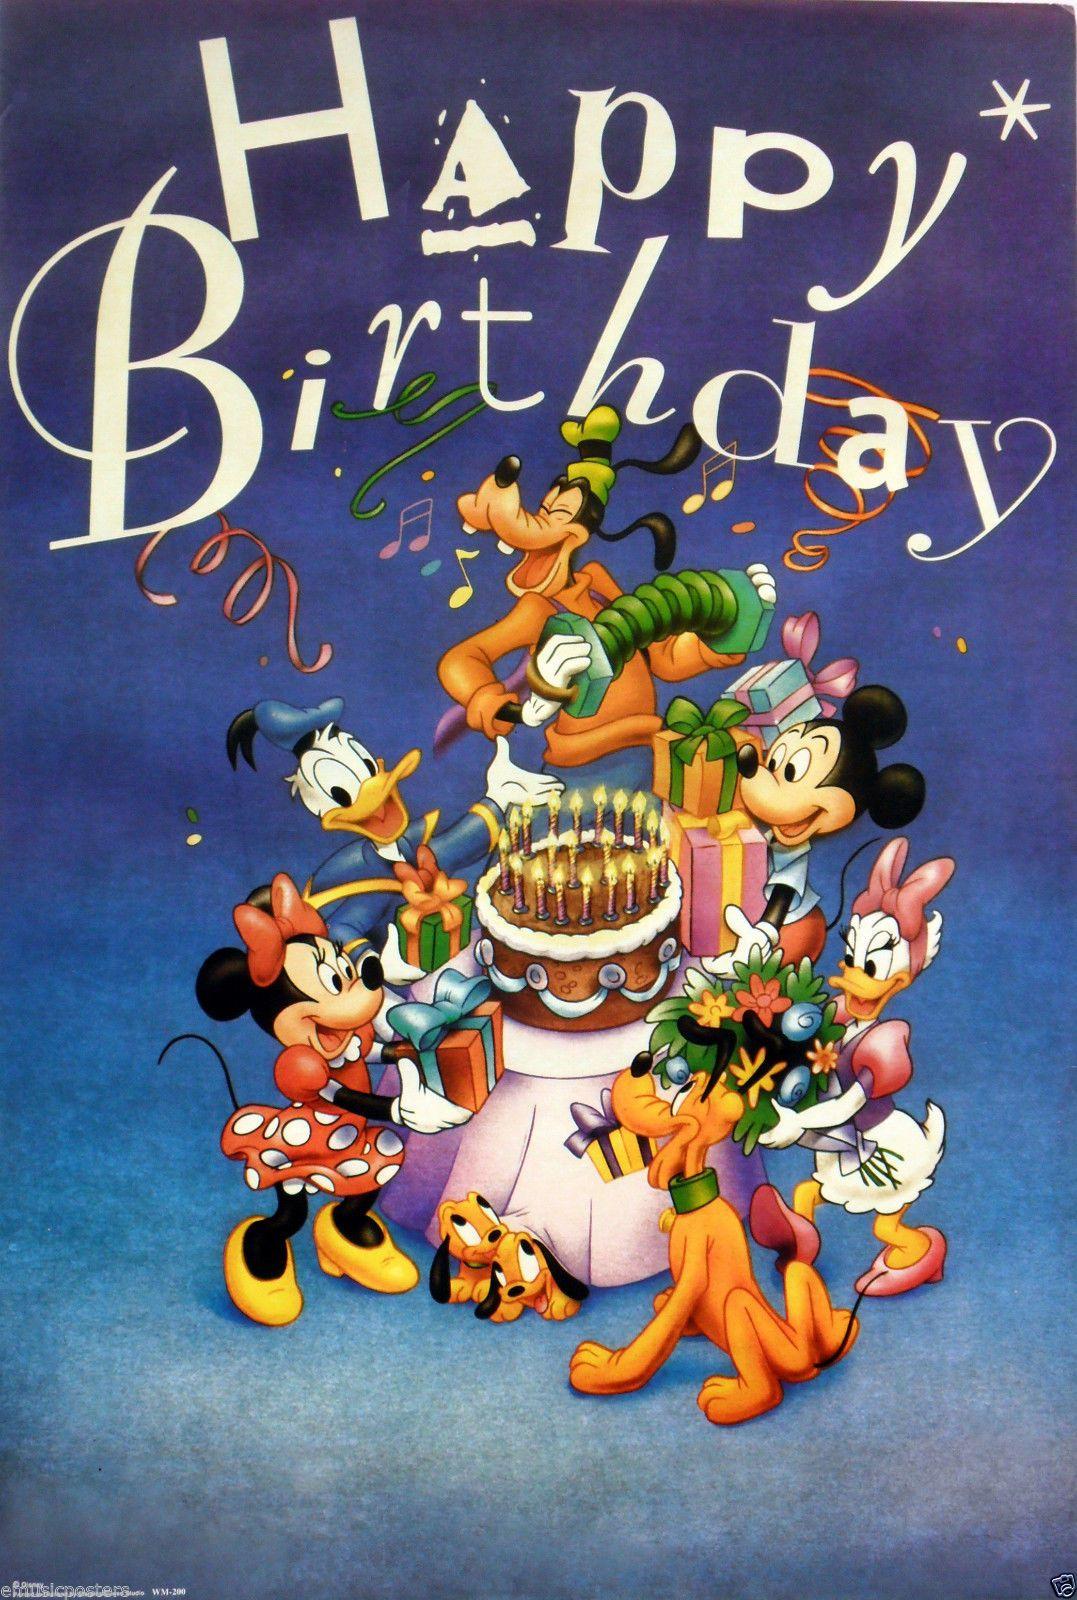 "Disney Happy Birthday Poster Goofy Mickey Minnie Mouse Donald Daisy Duck Ïッピーバースデー ¤ラスト Ïッピーバースデー ǔ»åƒ ɝ¢ç™½ã""誕生日"